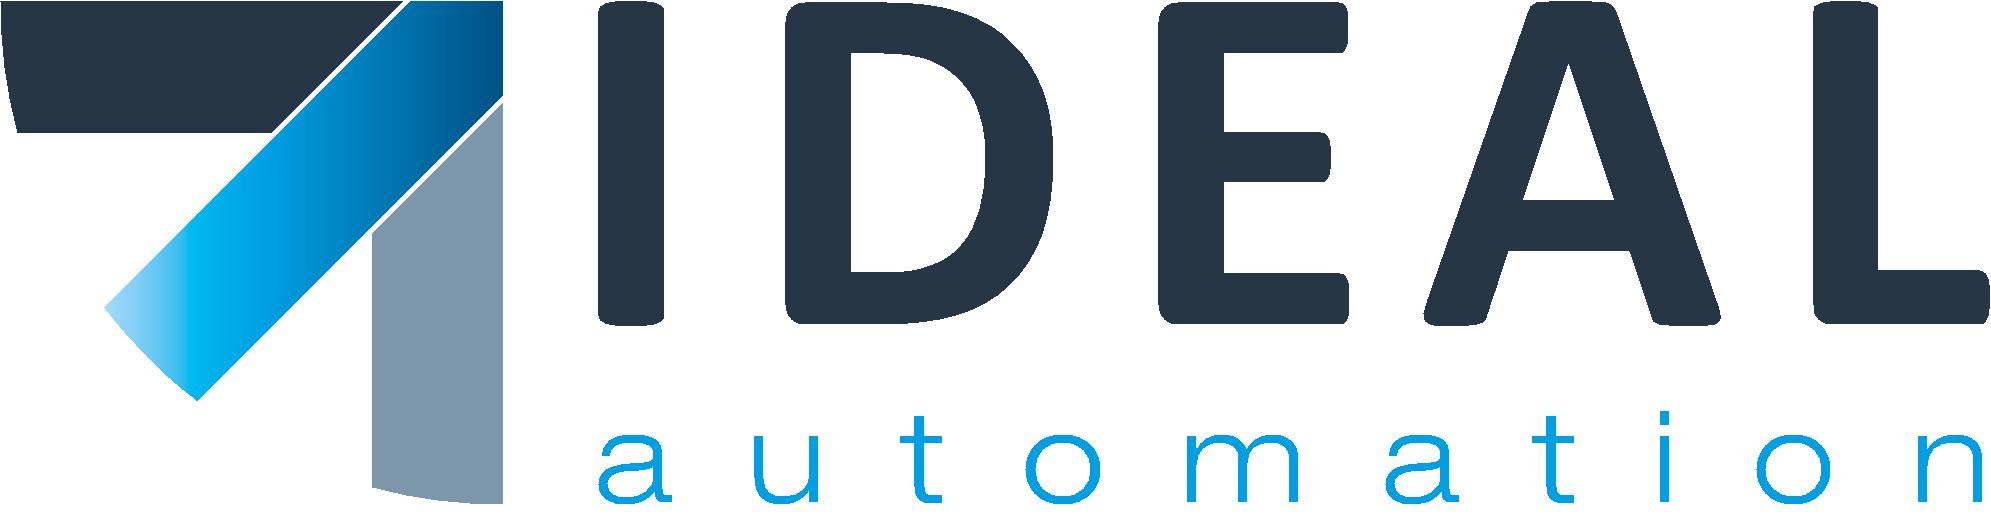 Informat Develop Automatisme Logistiqu